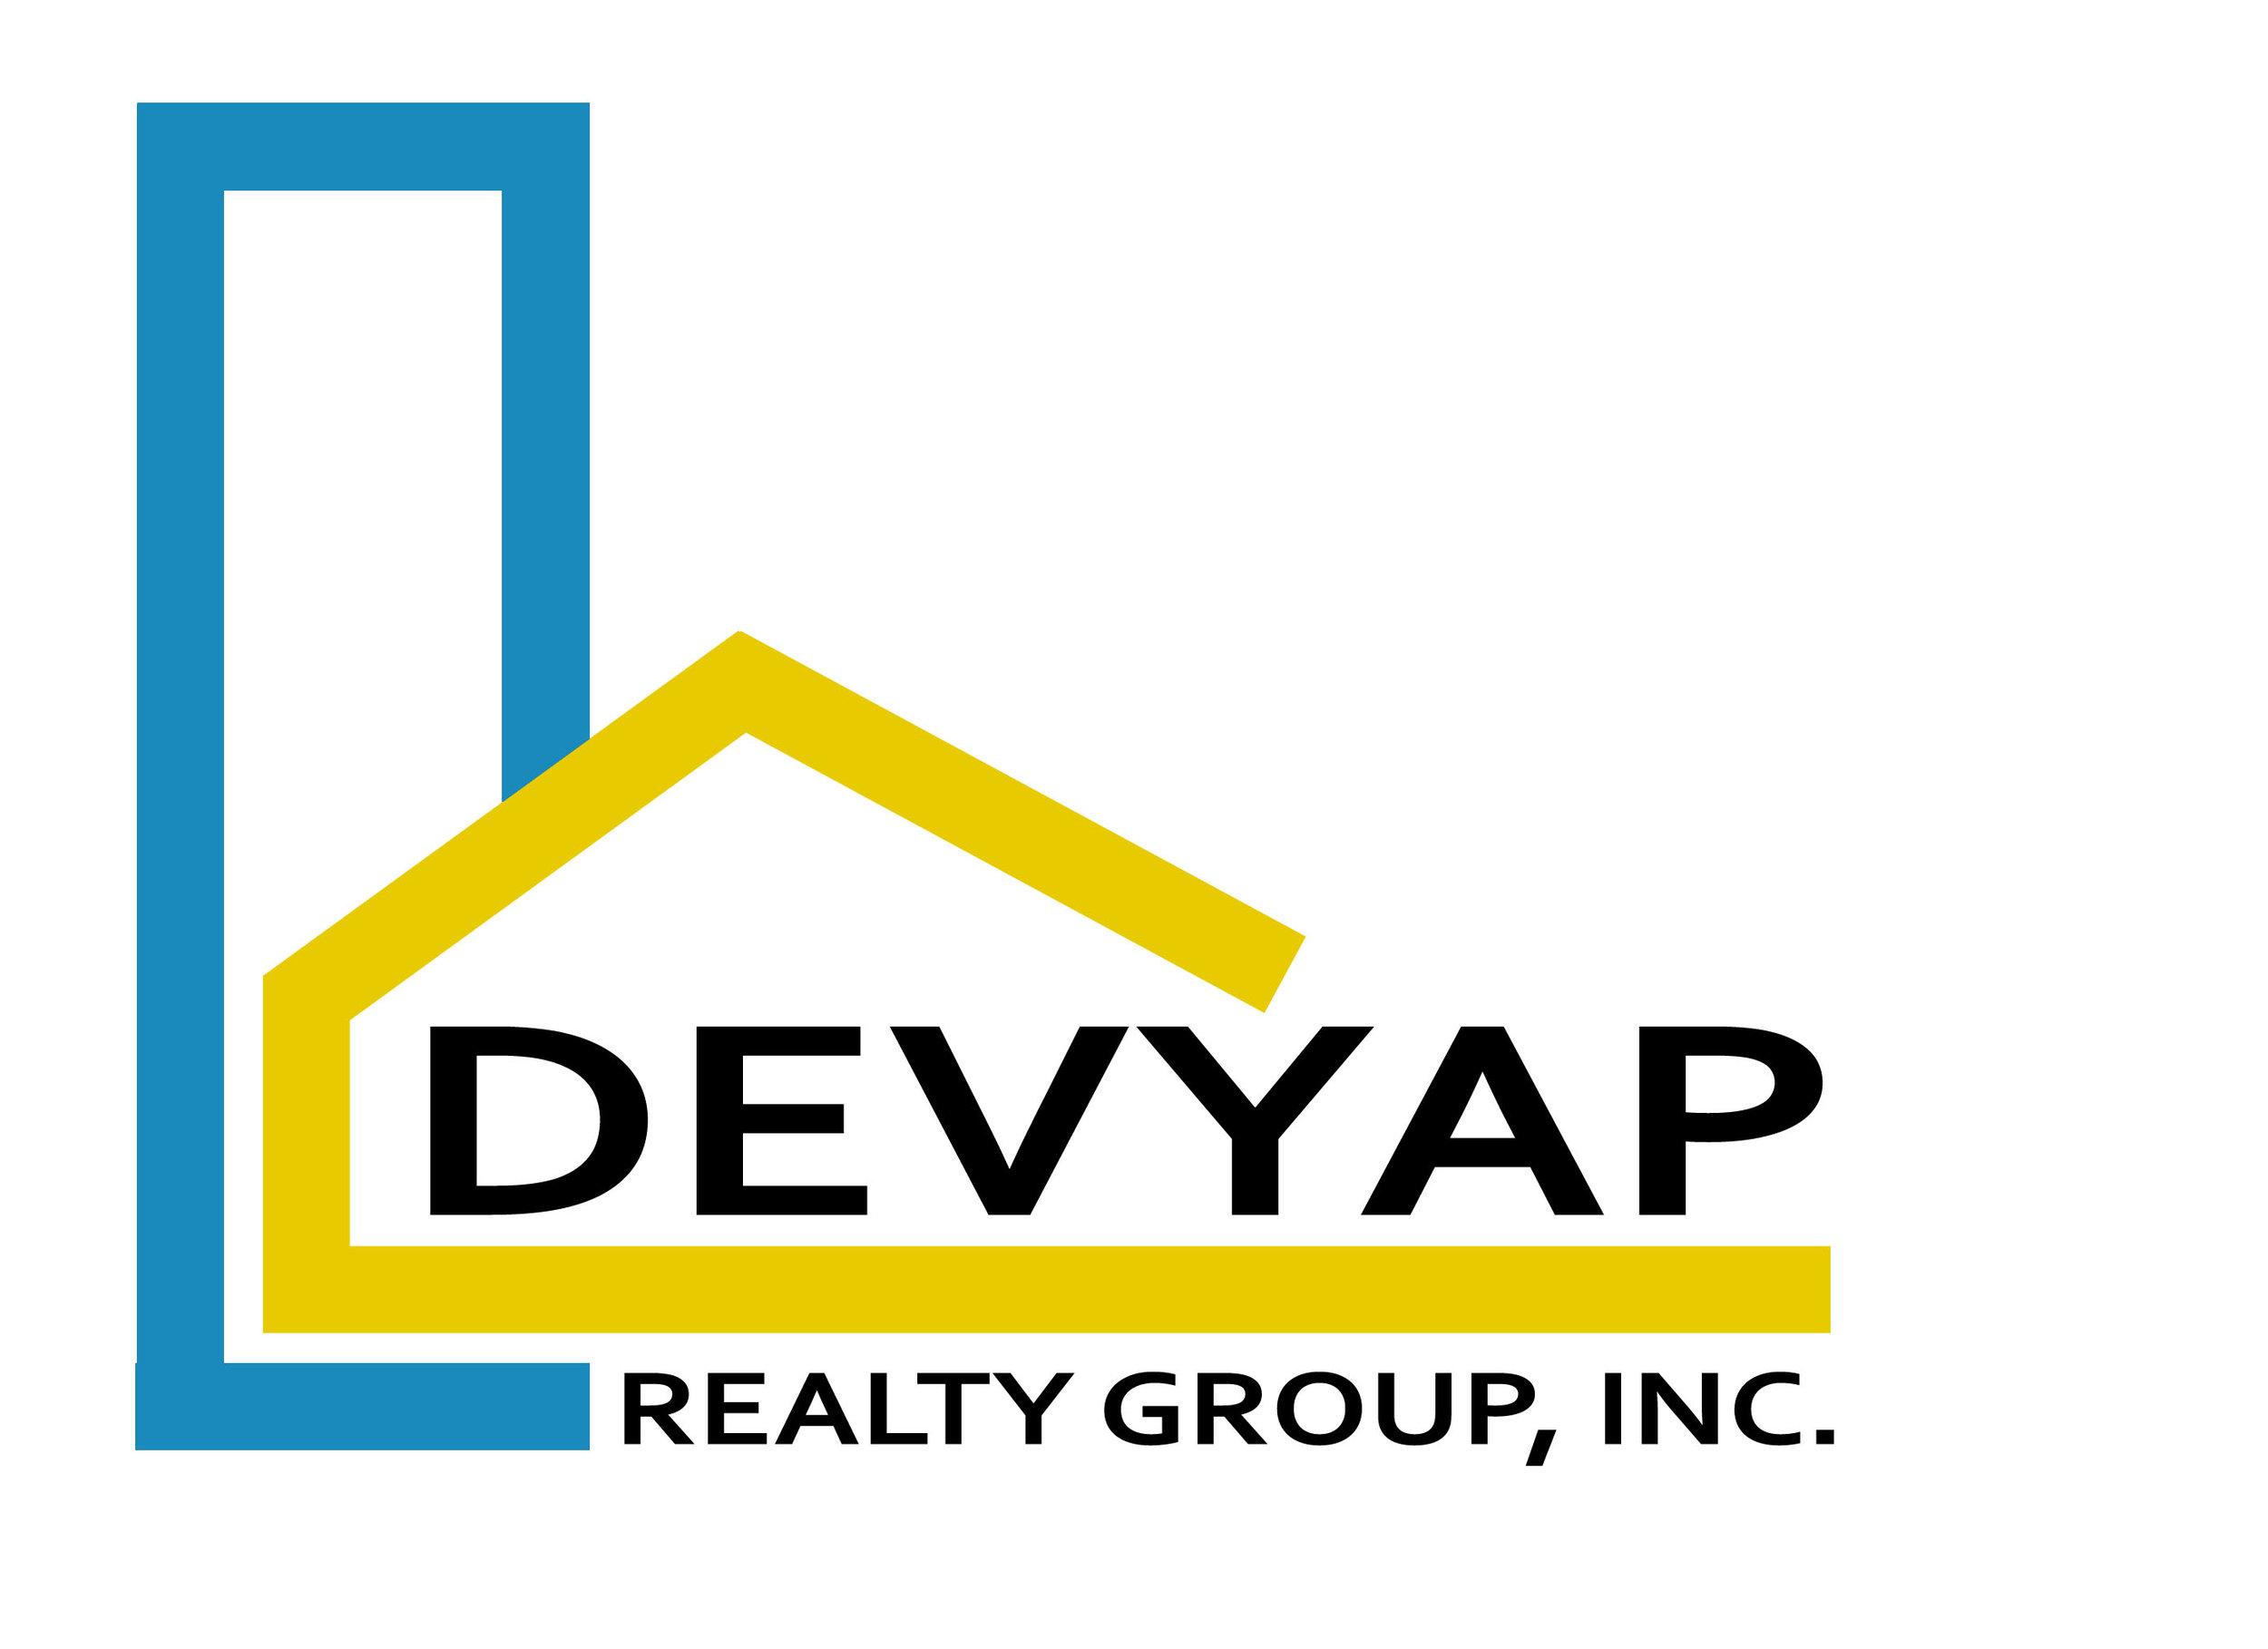 DevYap Logo 7 .jpg